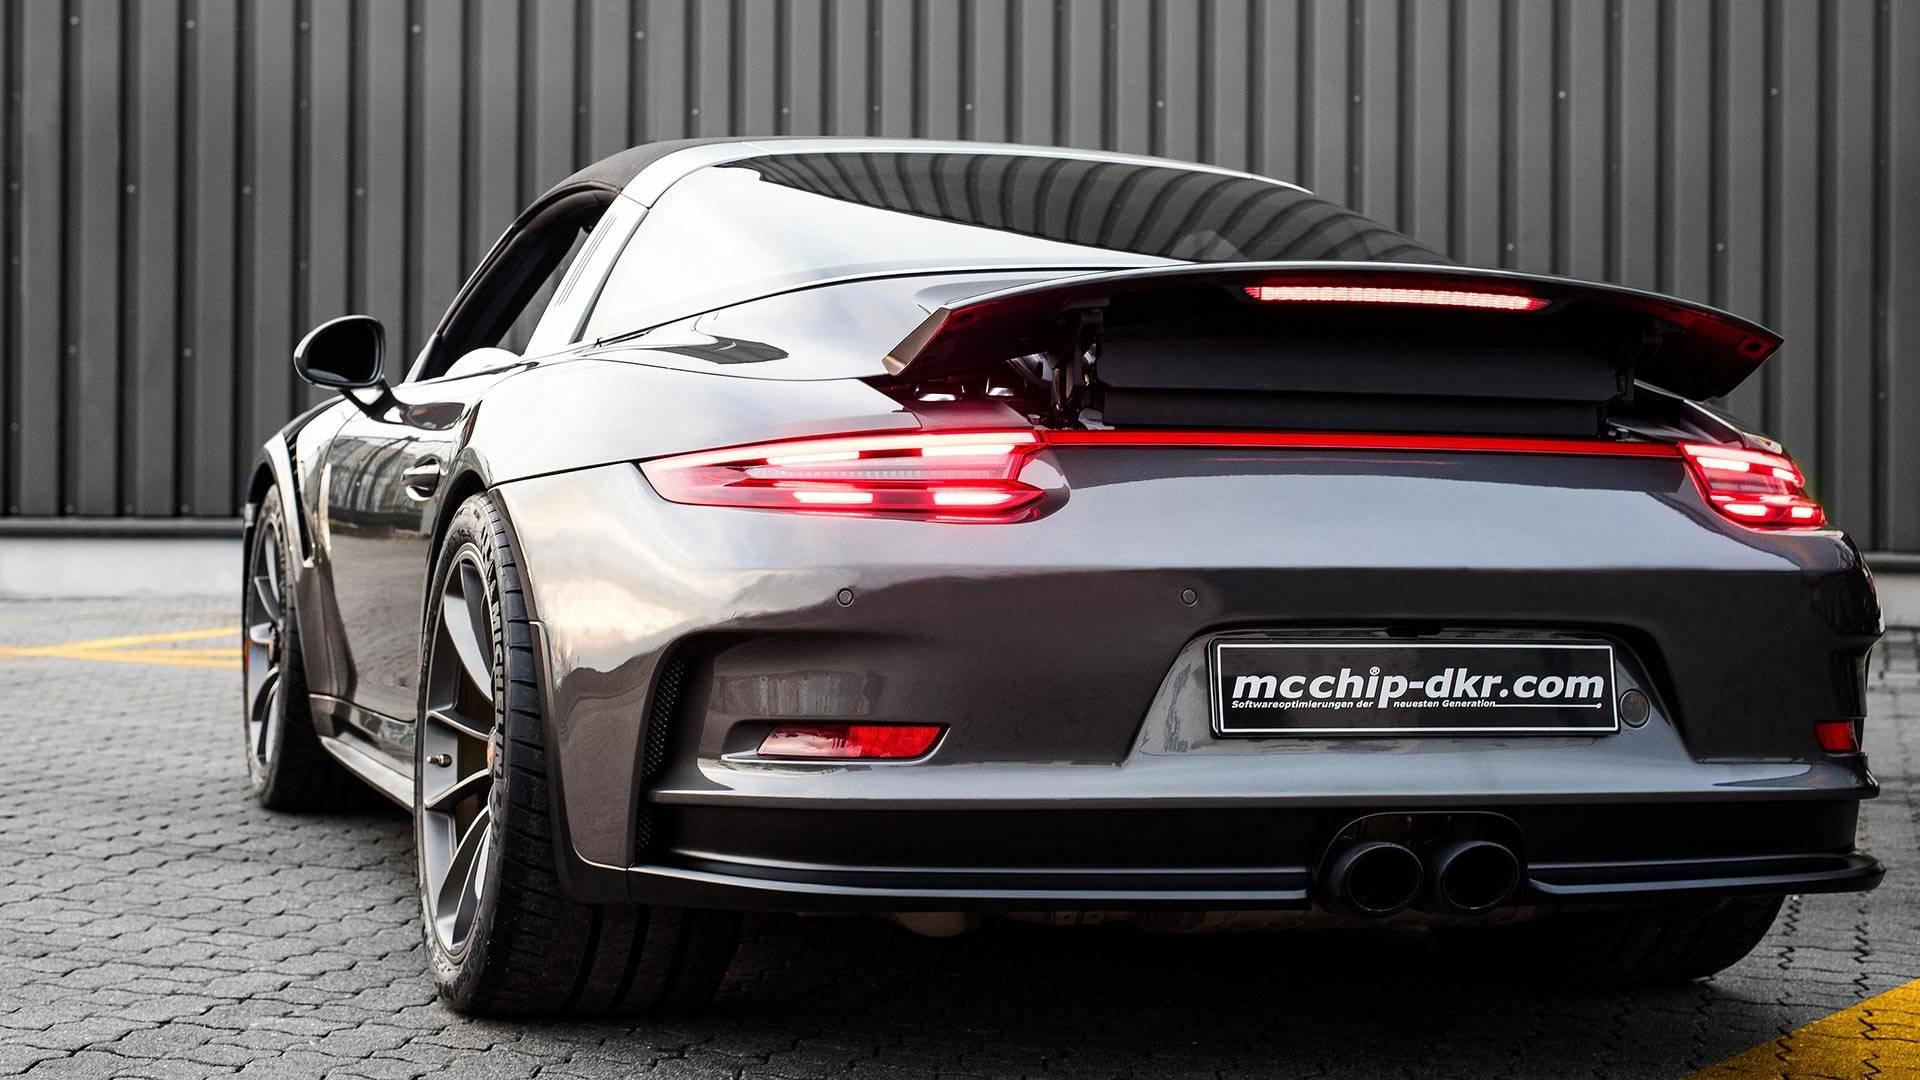 Porsche_911_Targa_GT3_by_Mcchip-dkr_0002